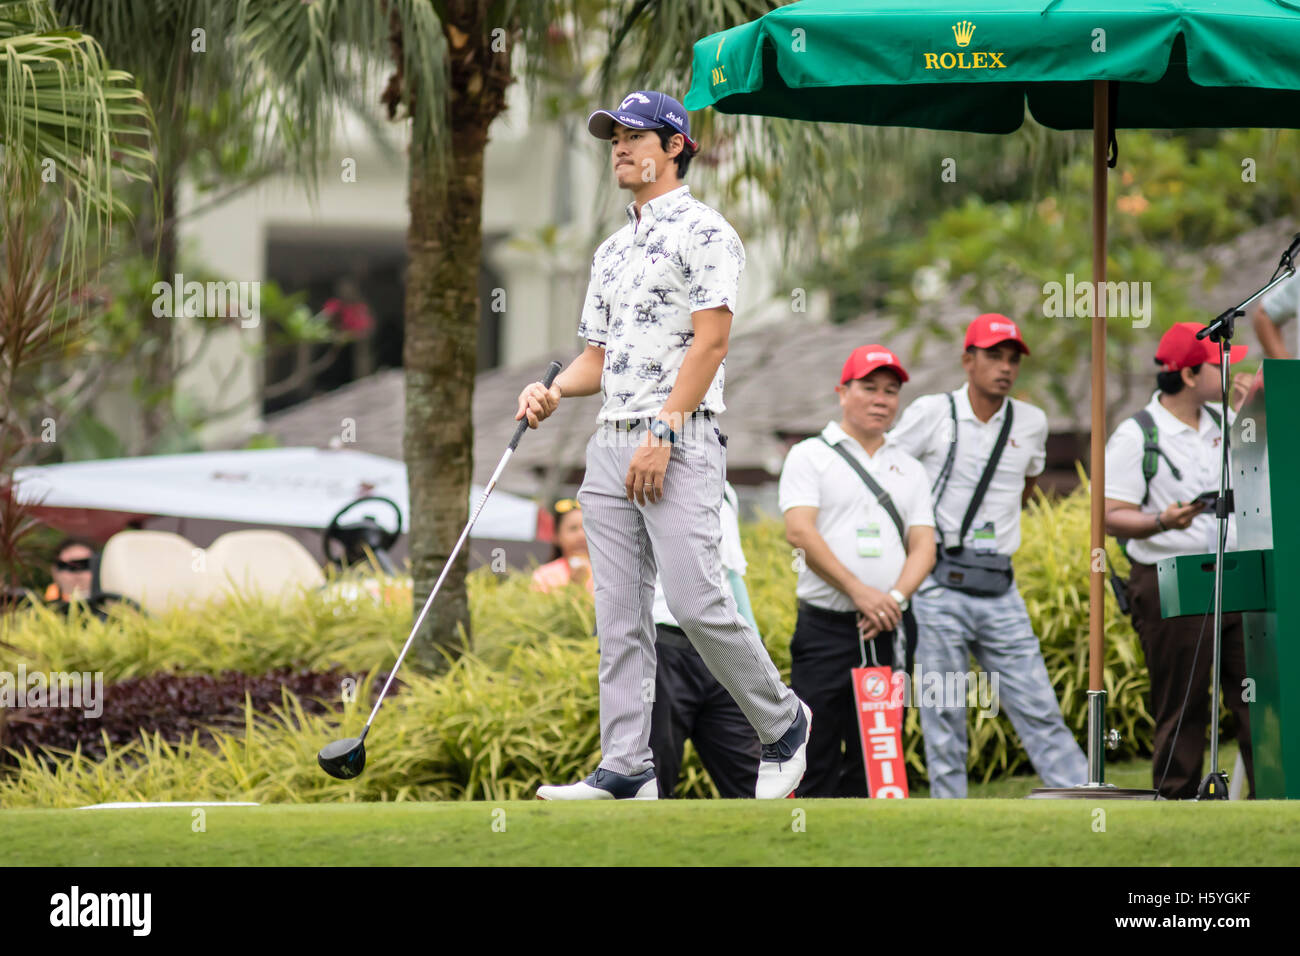 Kuala Lumpur, Malaysia. 22nd Oct, 2016. Round 3 see Ryo Ishikawa getting ready to tee off at CIMB PGA 2016 Championship - Stock Image